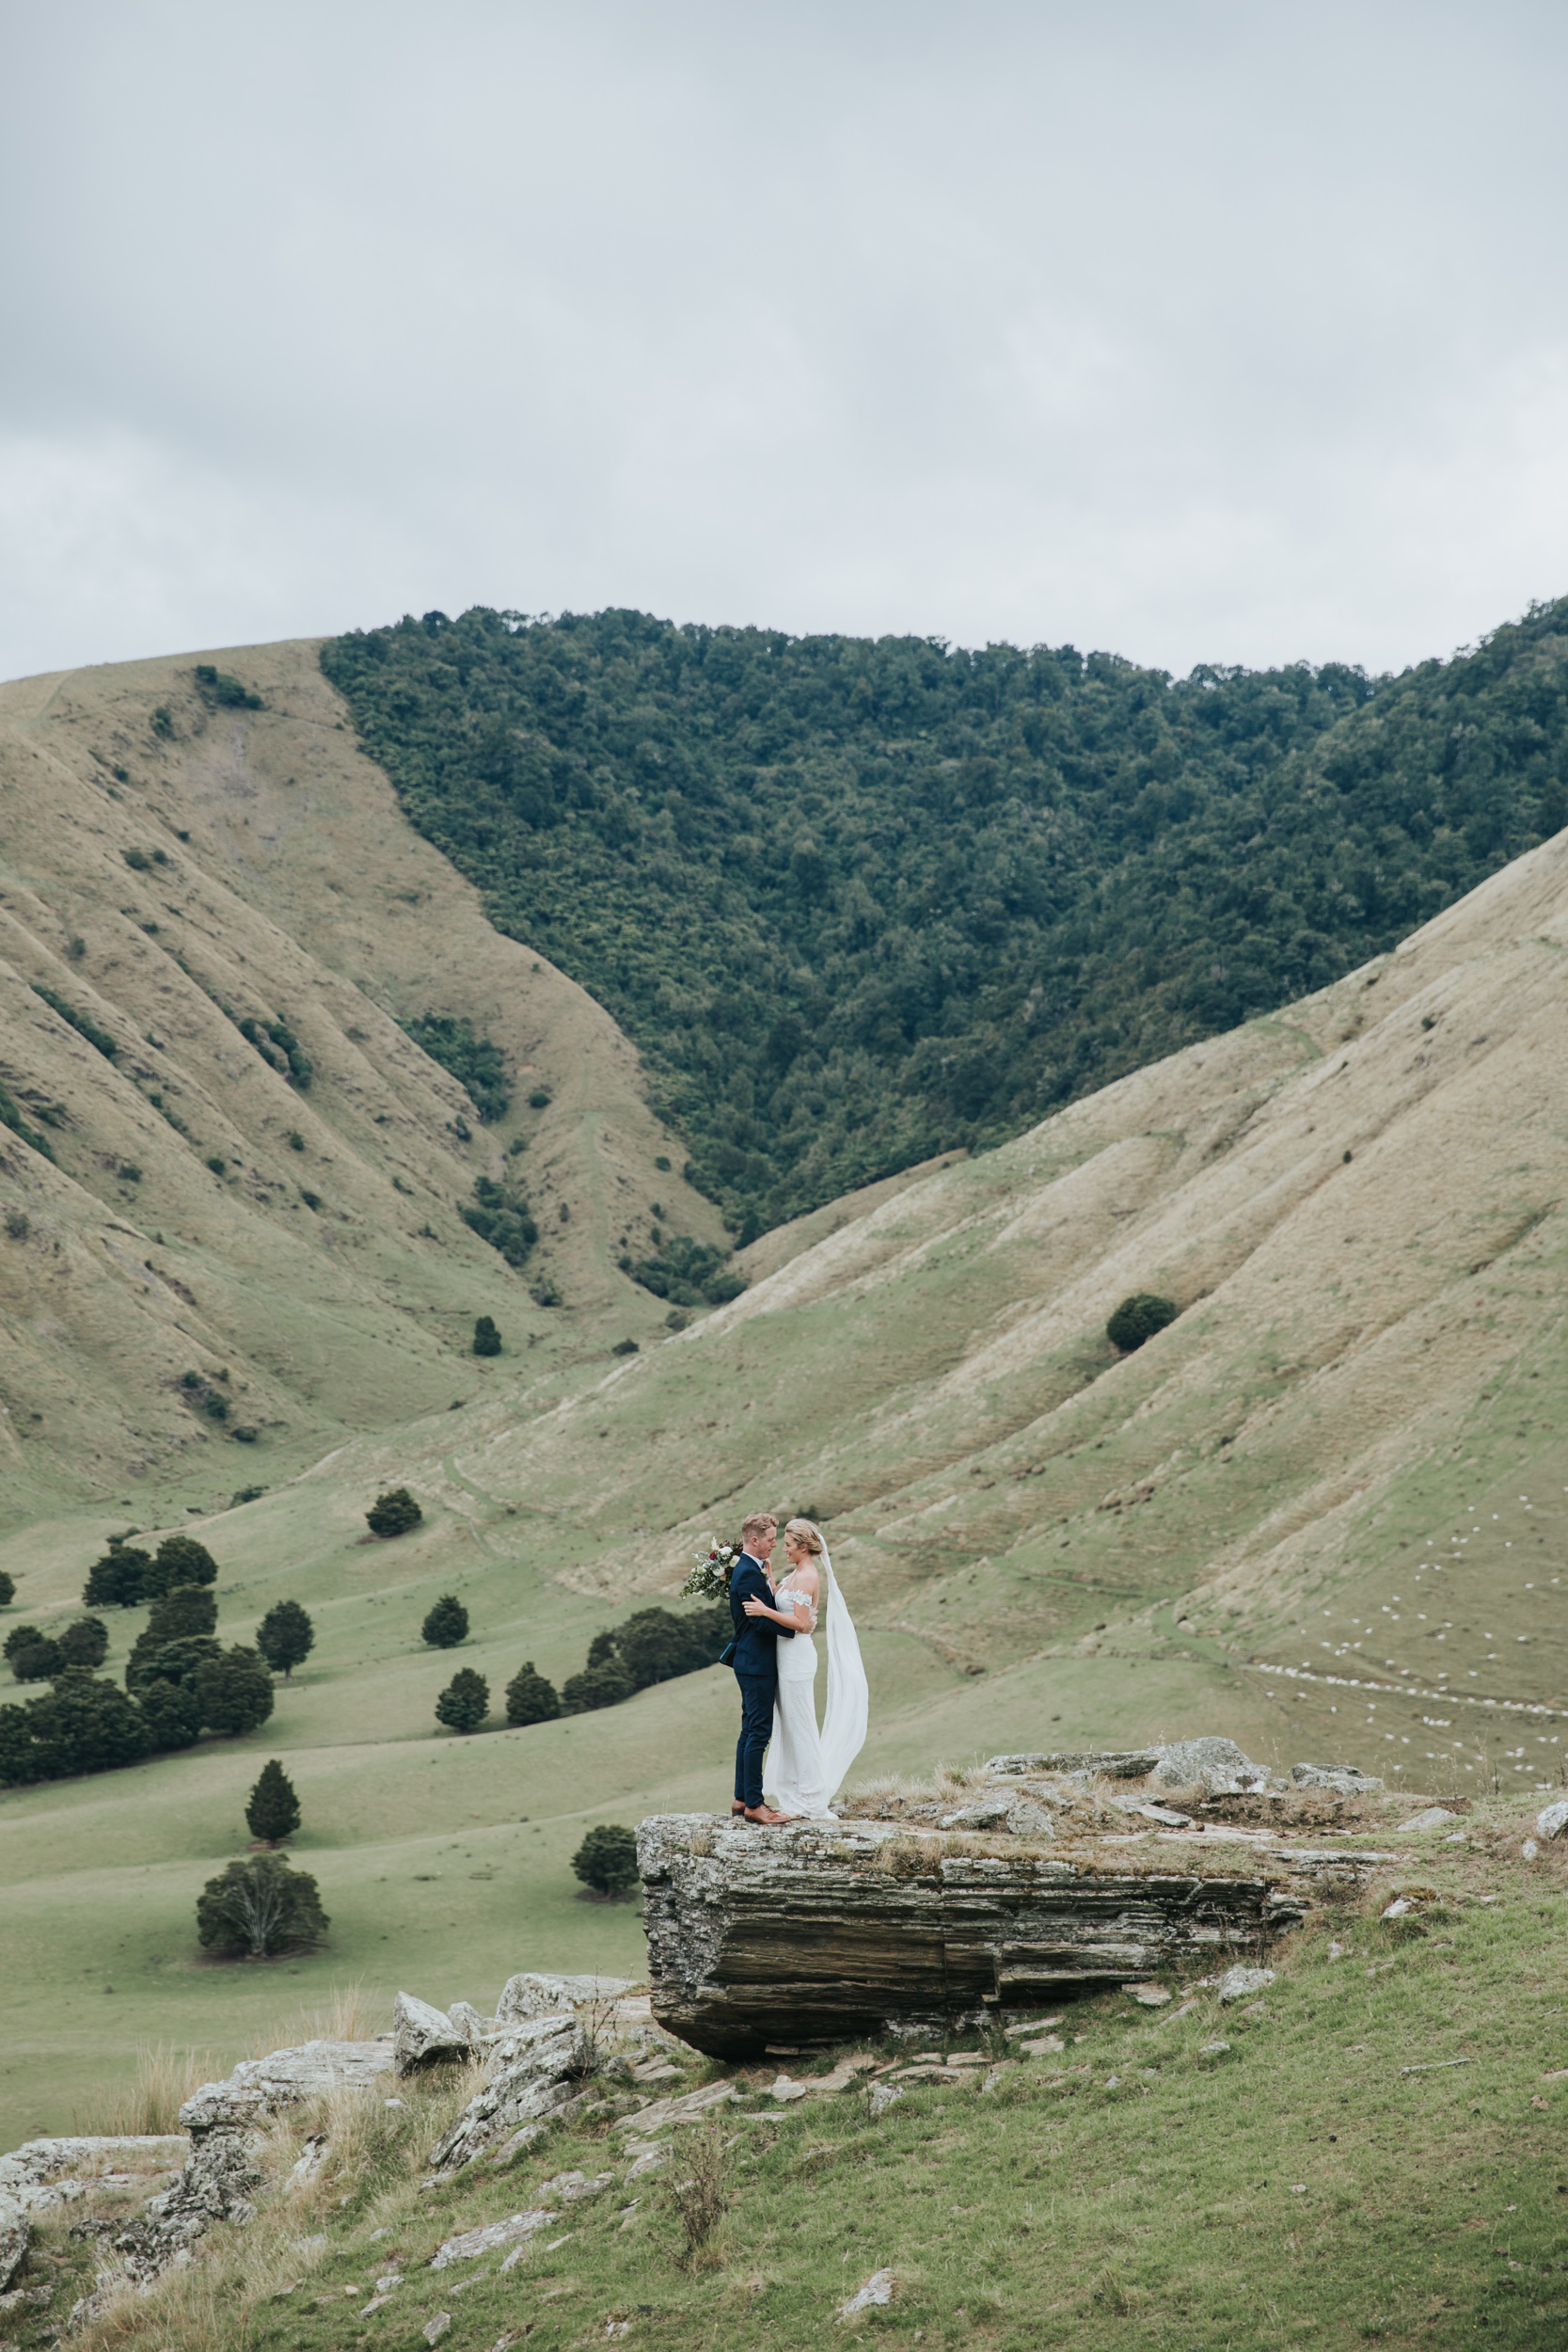 Kaituna Ridges Farm - MARLBOROUGH, NEW ZEALANDPOP UP WEDDING